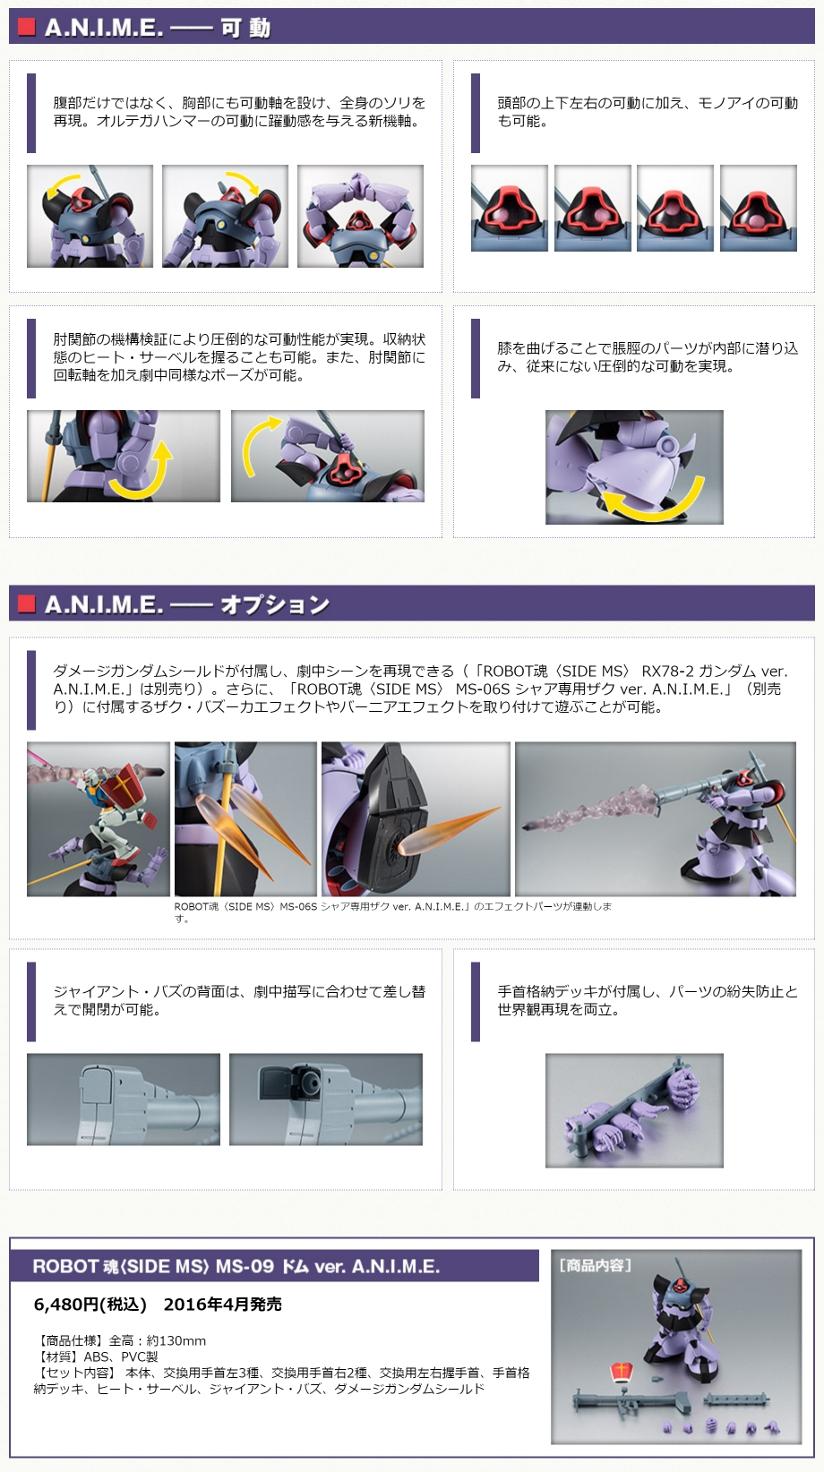 ROBOT魂 MS-09 ドム ver. A.N.I.M.E.の商品説明画像02